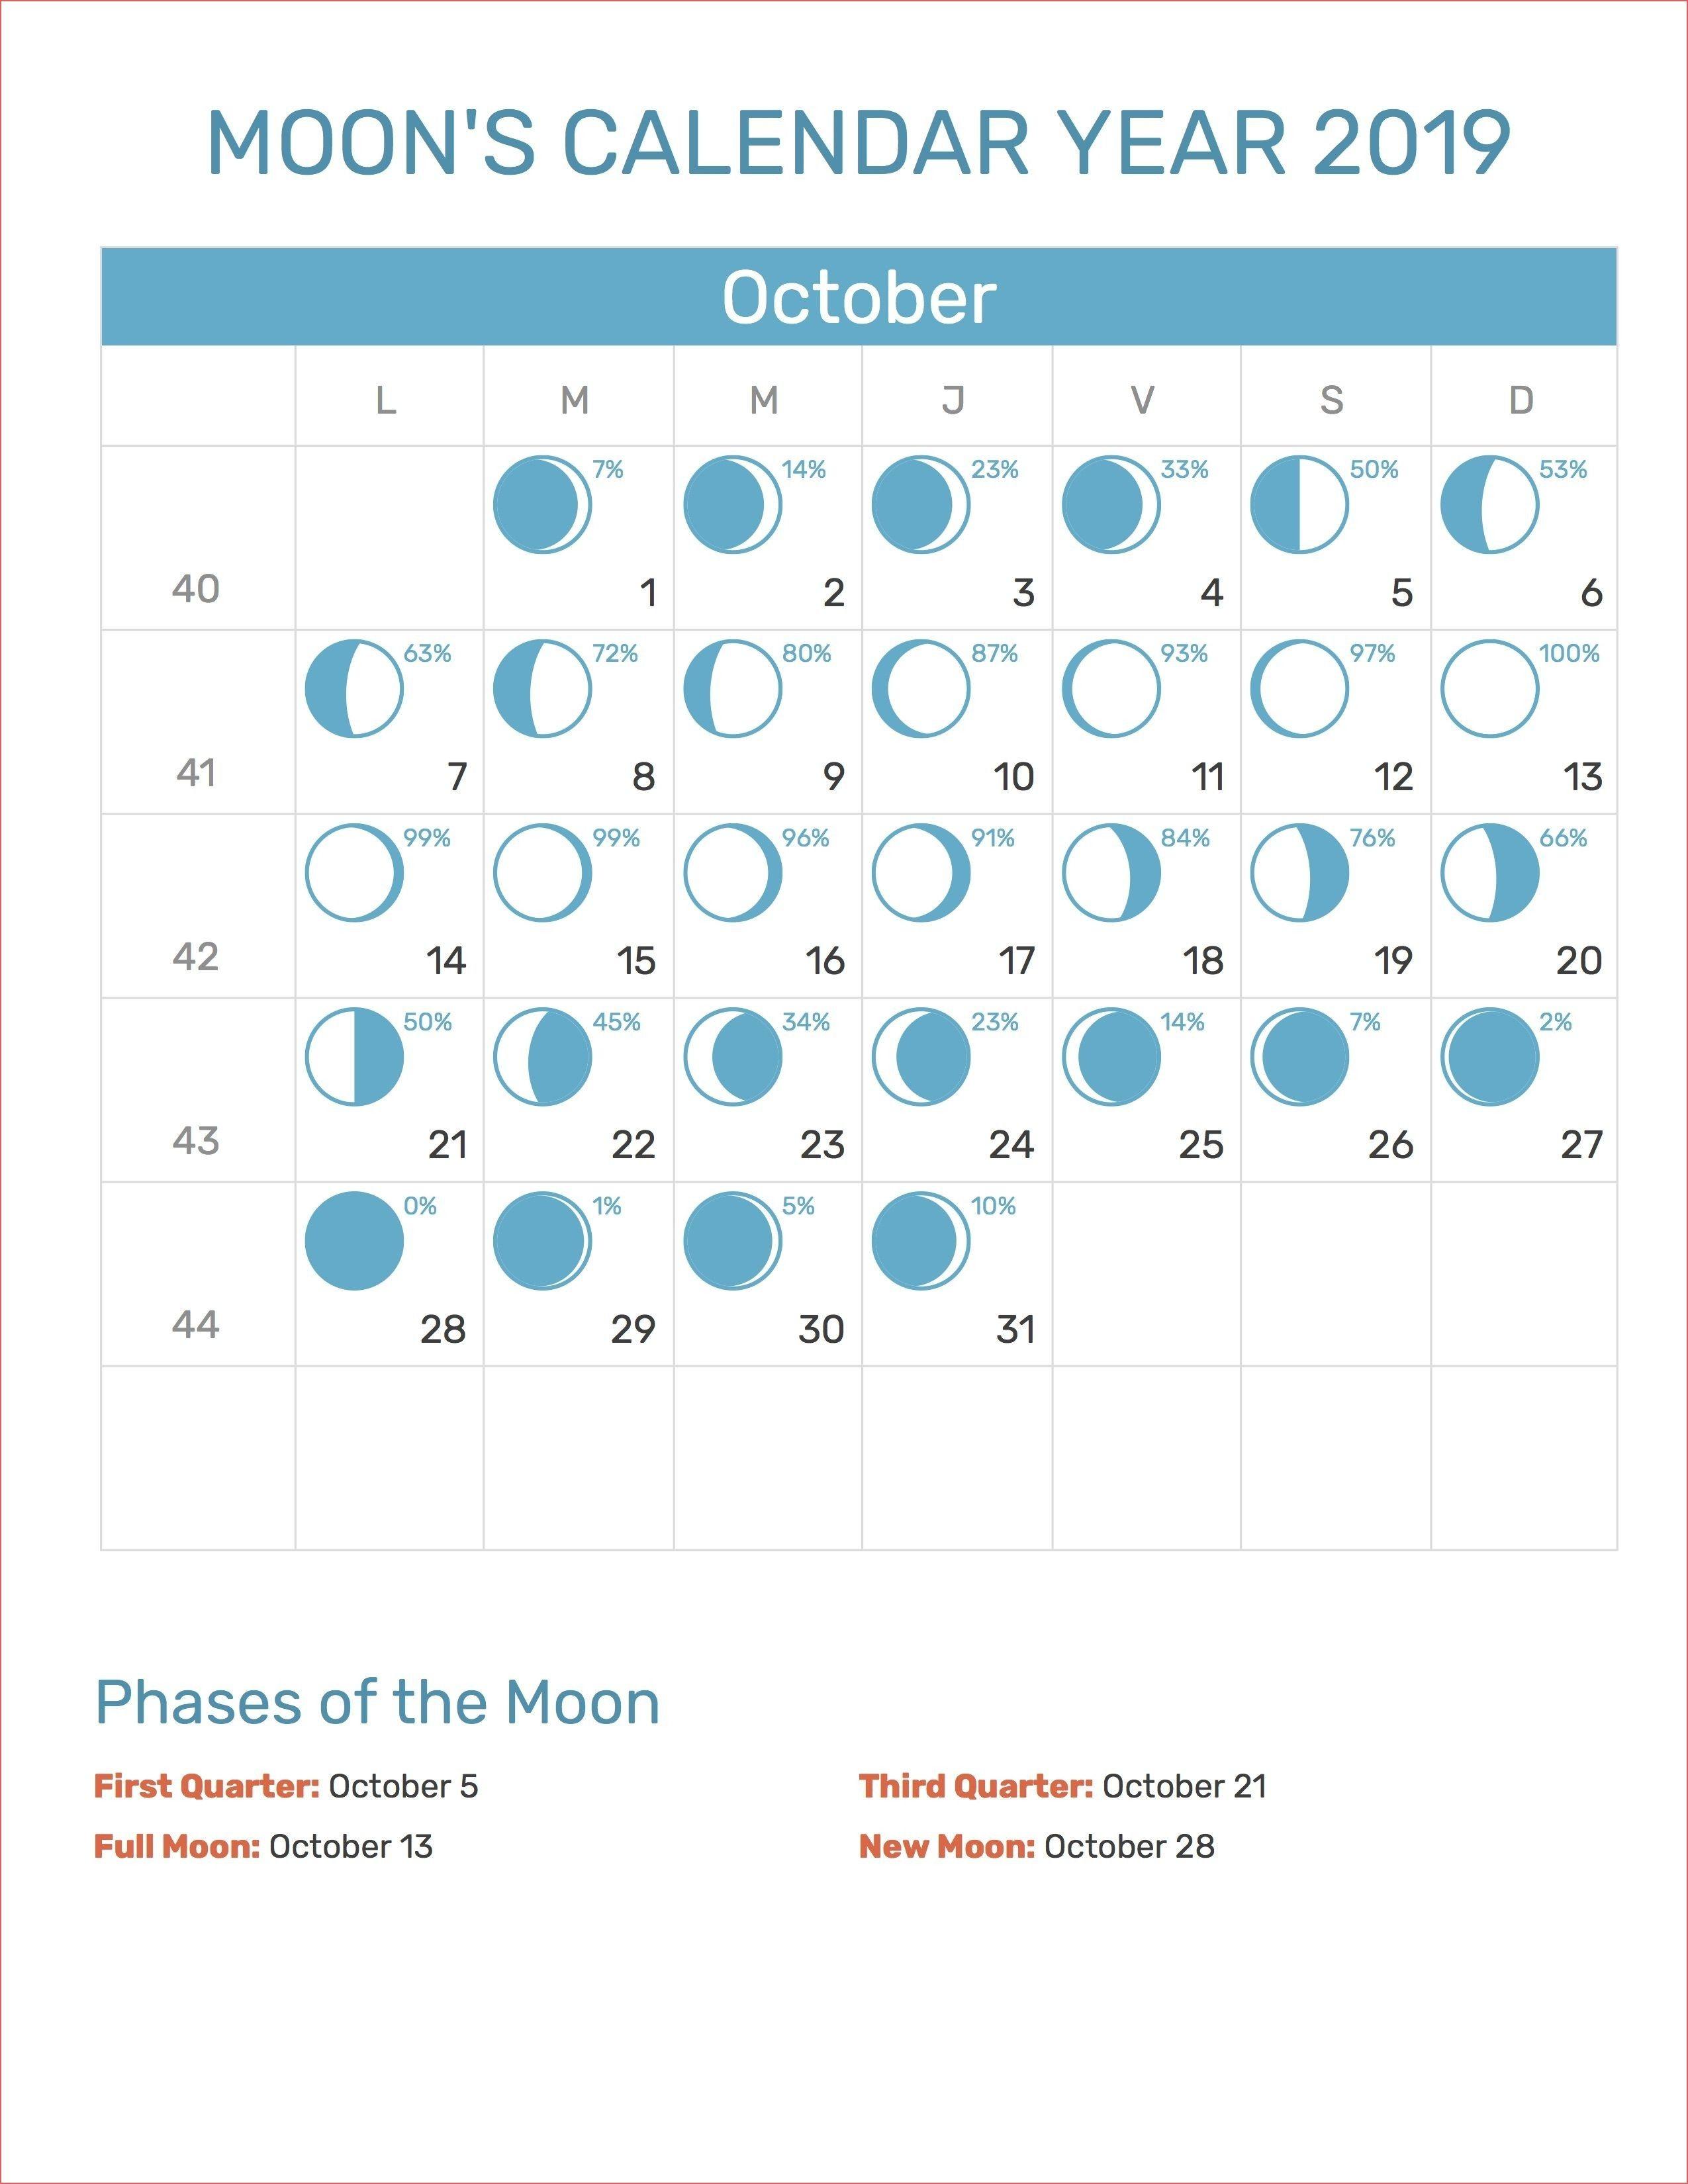 Full Moon Calendar 2019 Printable October | Calendar Format Example throughout Full Moon Calendar 2019 Printable October